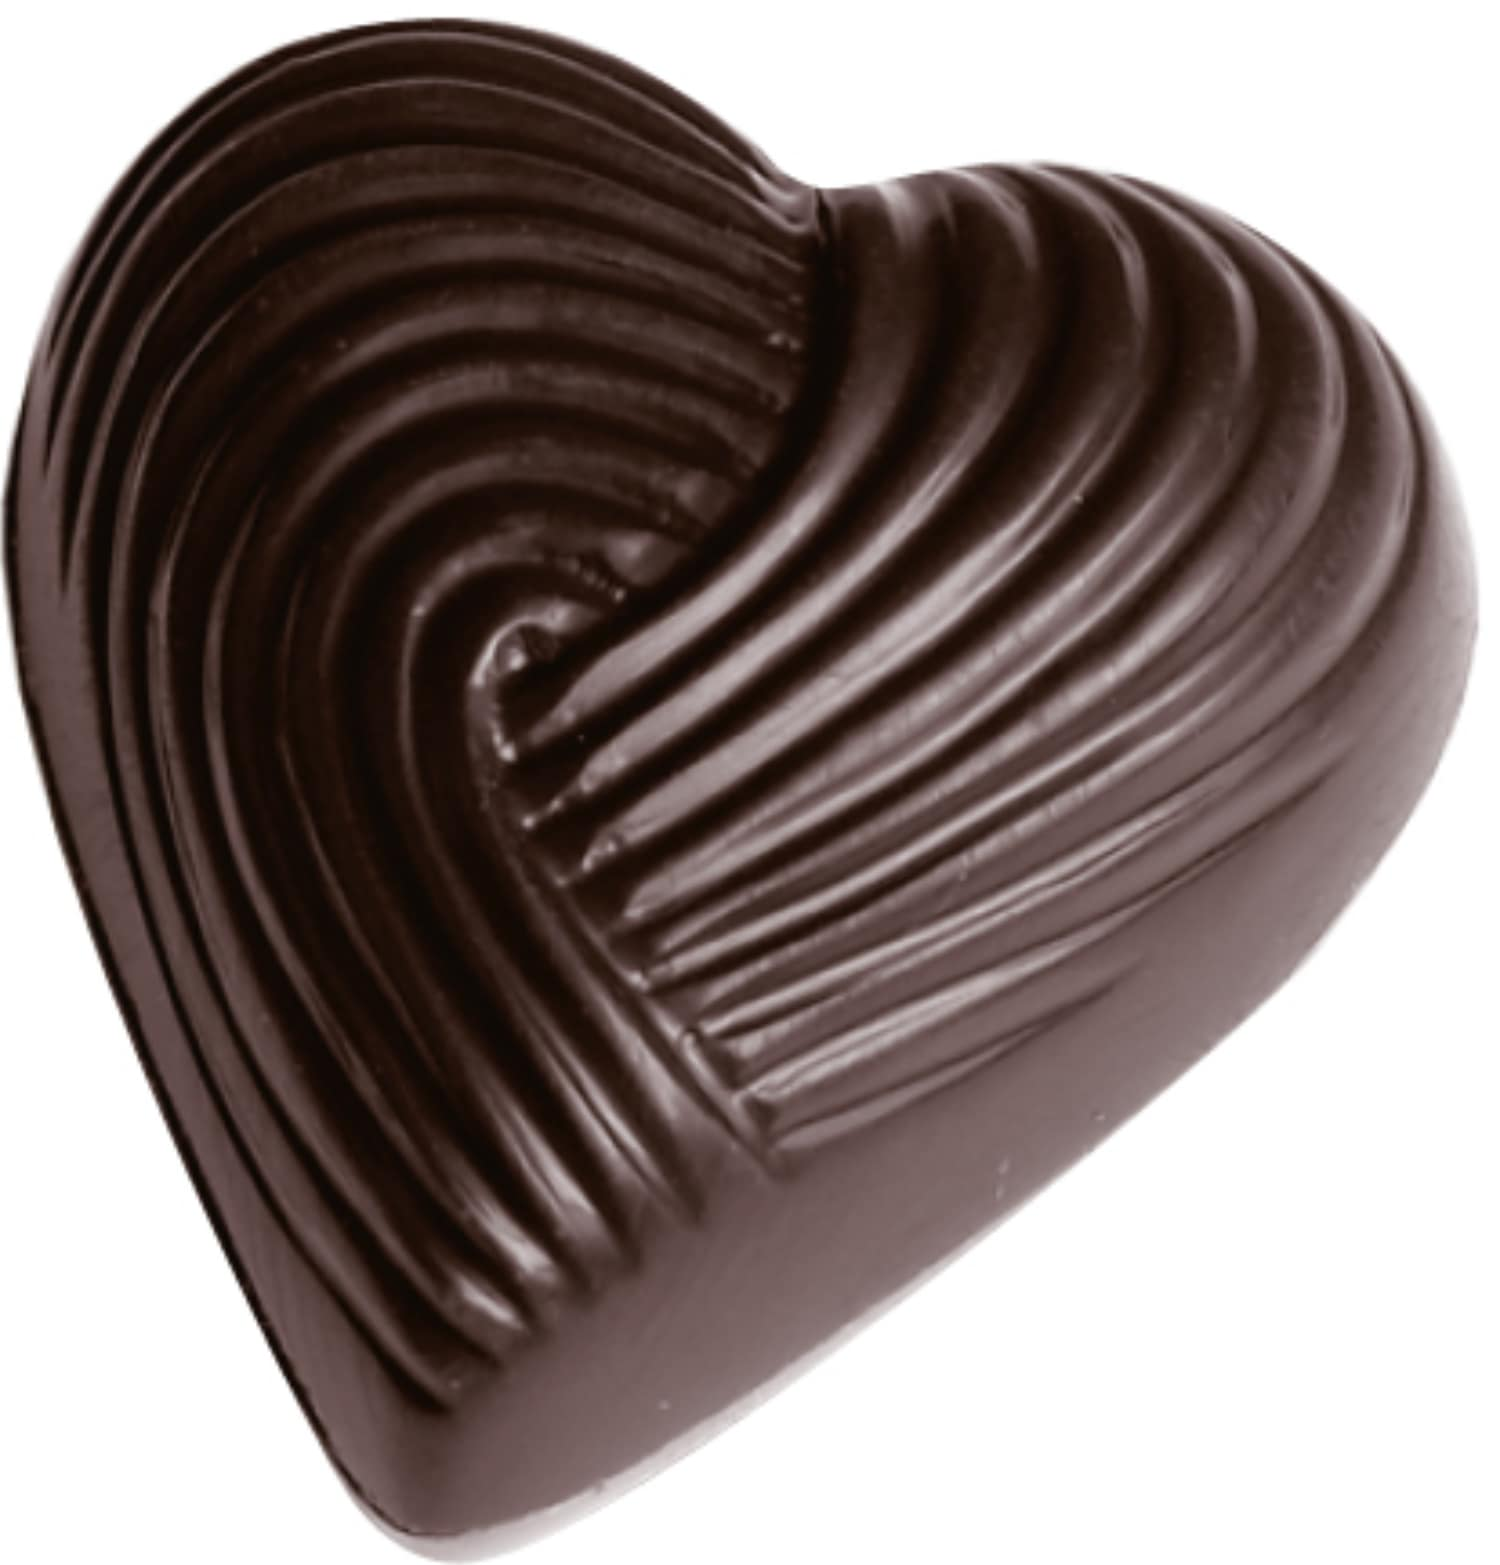 "Schokoladenform ""Herz"" 421513"